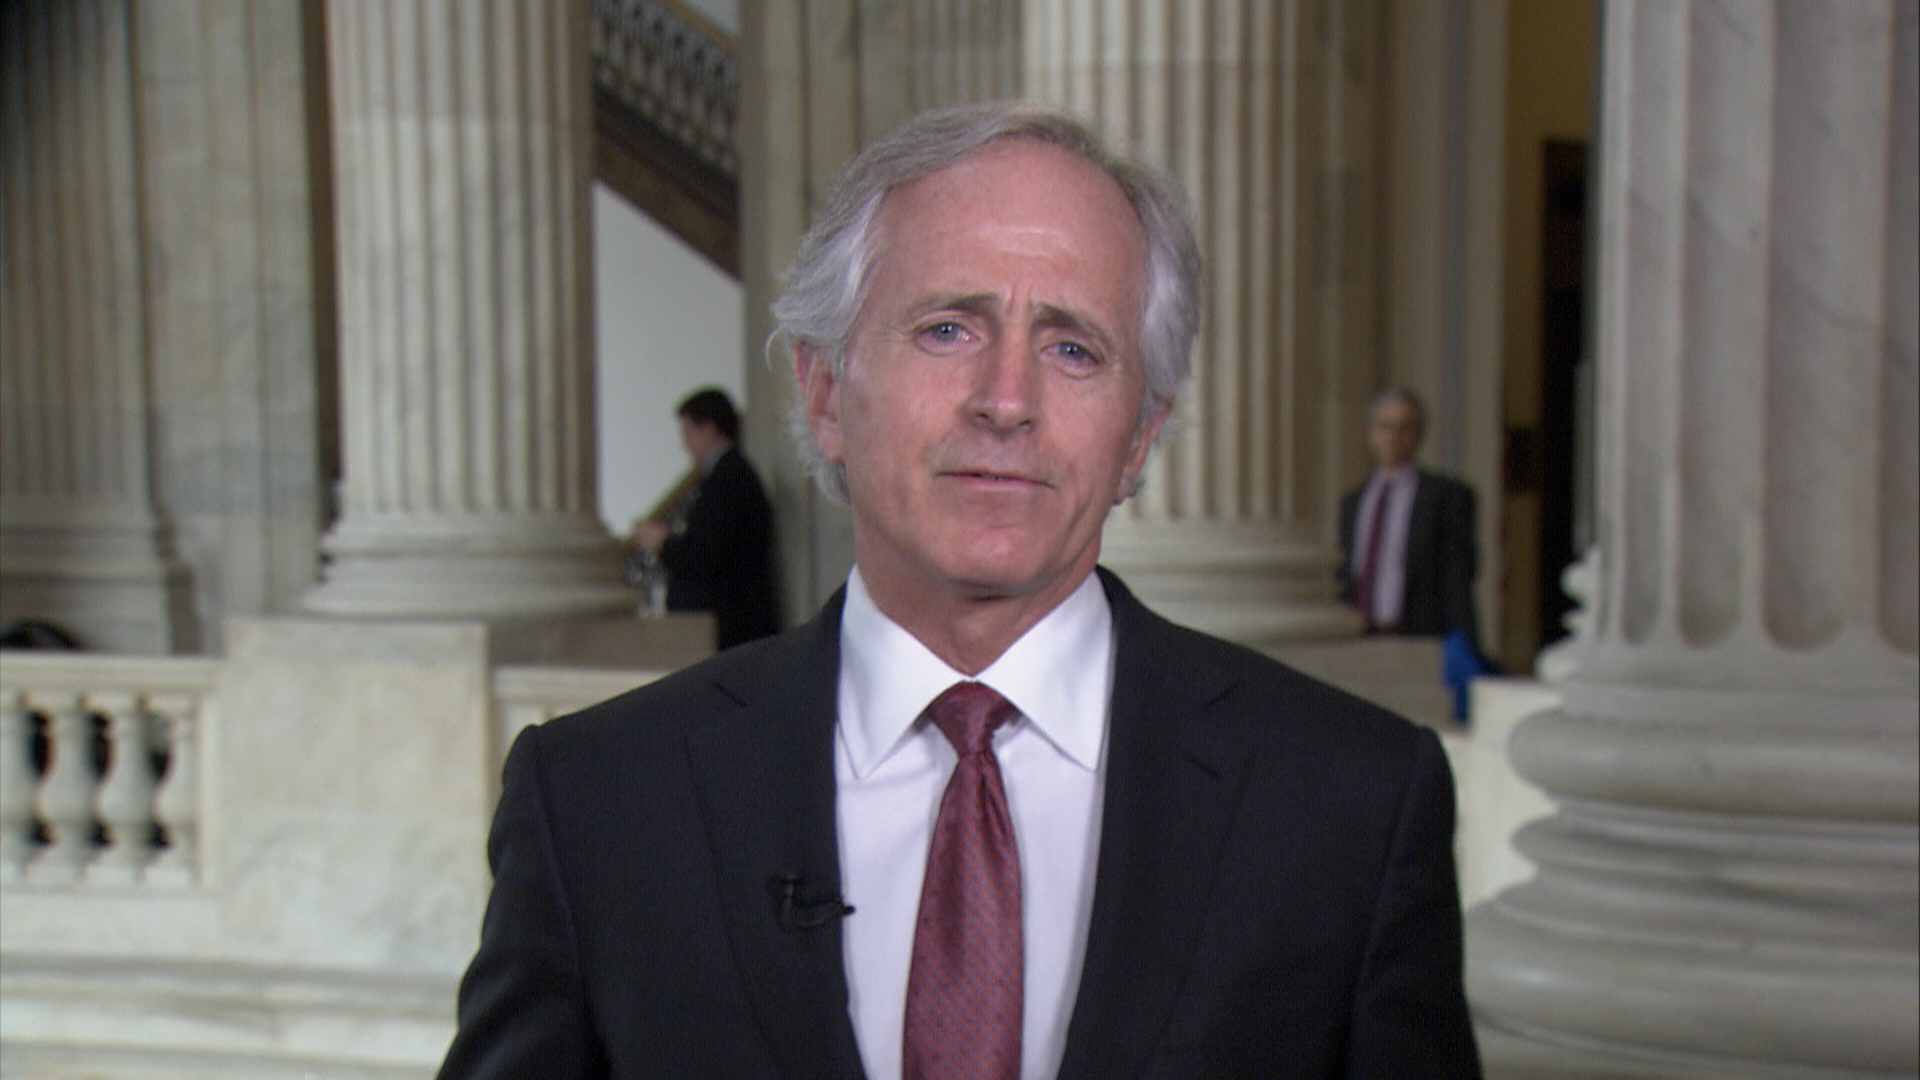 Sen. Corker: 'We've let down' Syria's people